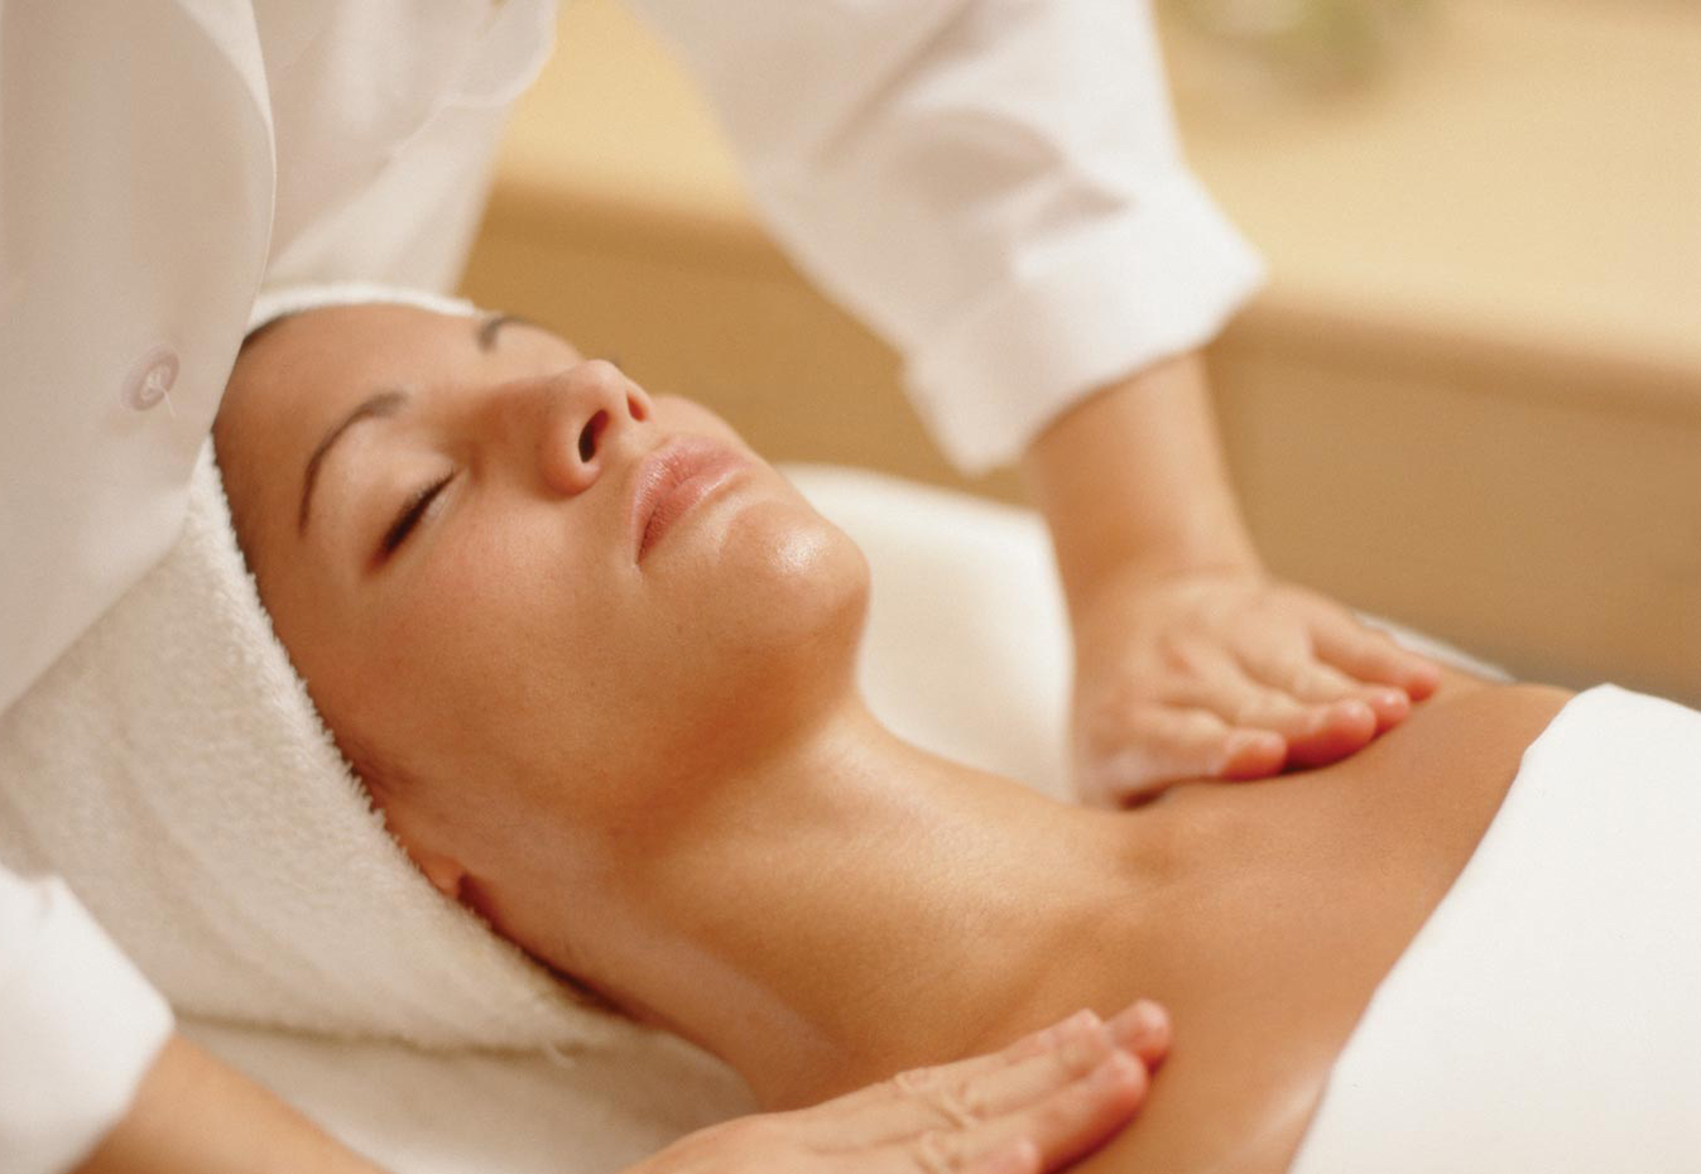 Körper zu Körpermassage in Riad